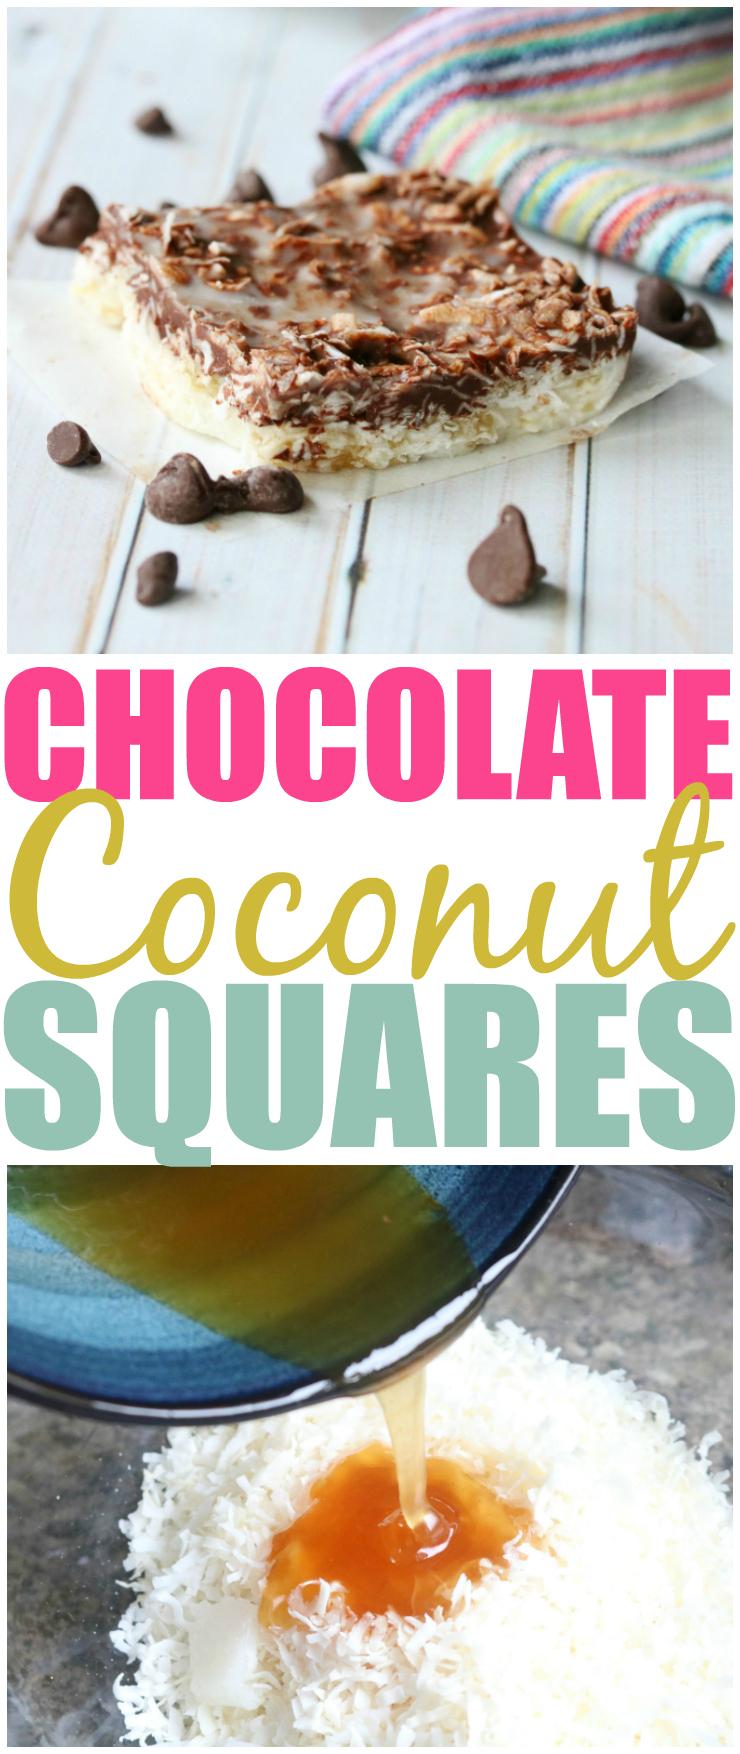 Chocolate Coconut Squares Pin